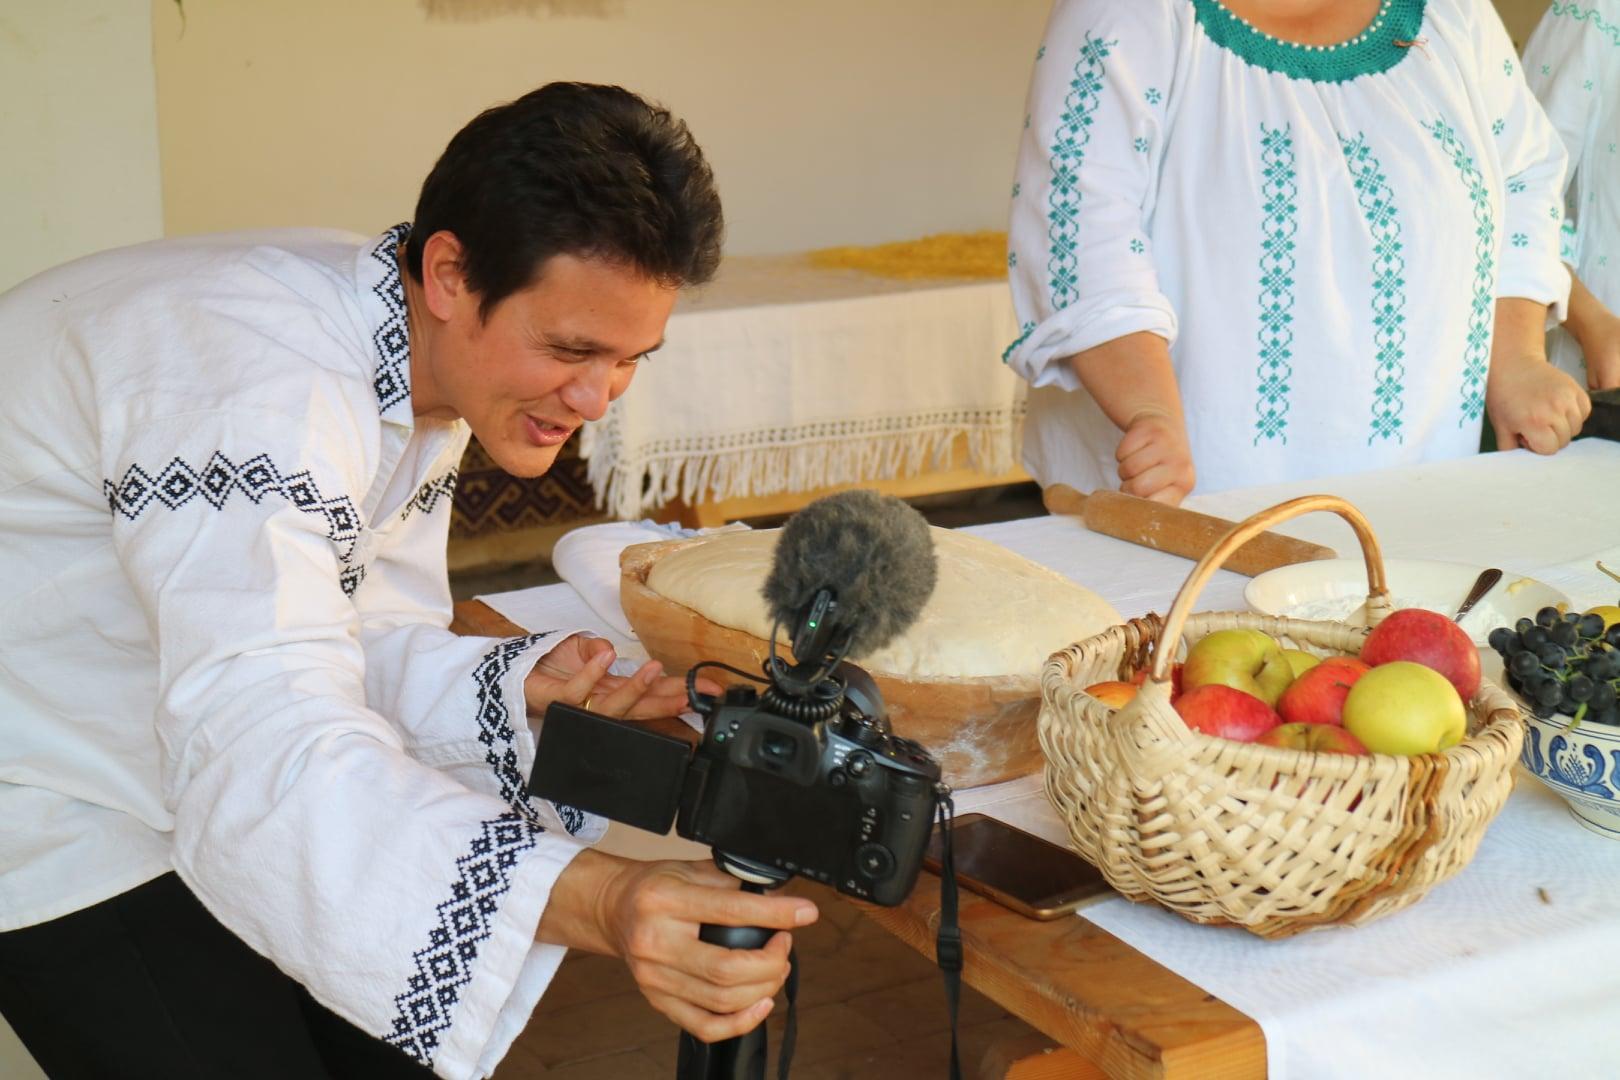 Mihai Eminescu Trust, gazda celui mai cunoscut vlogger culinar din lume în Transilvania